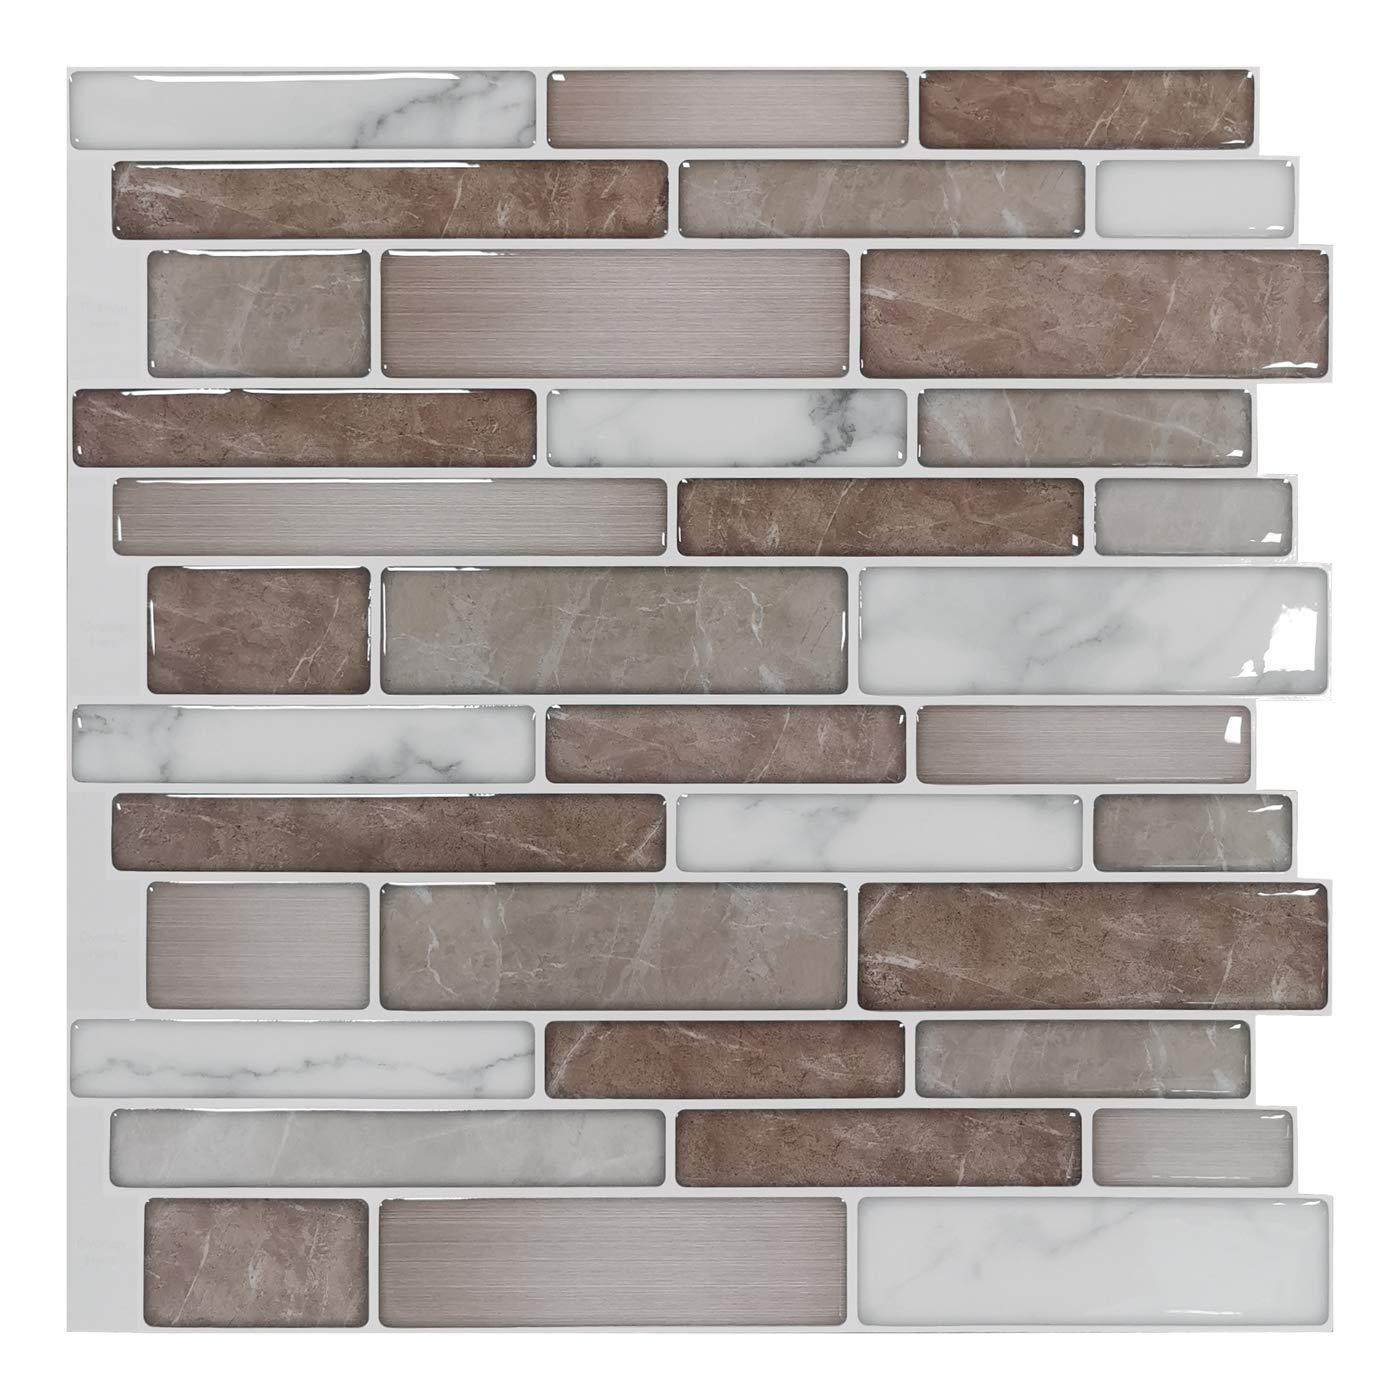 A17013 - 10-Sheet Premium Stick On Kitchen Backsplash Tiles, 12